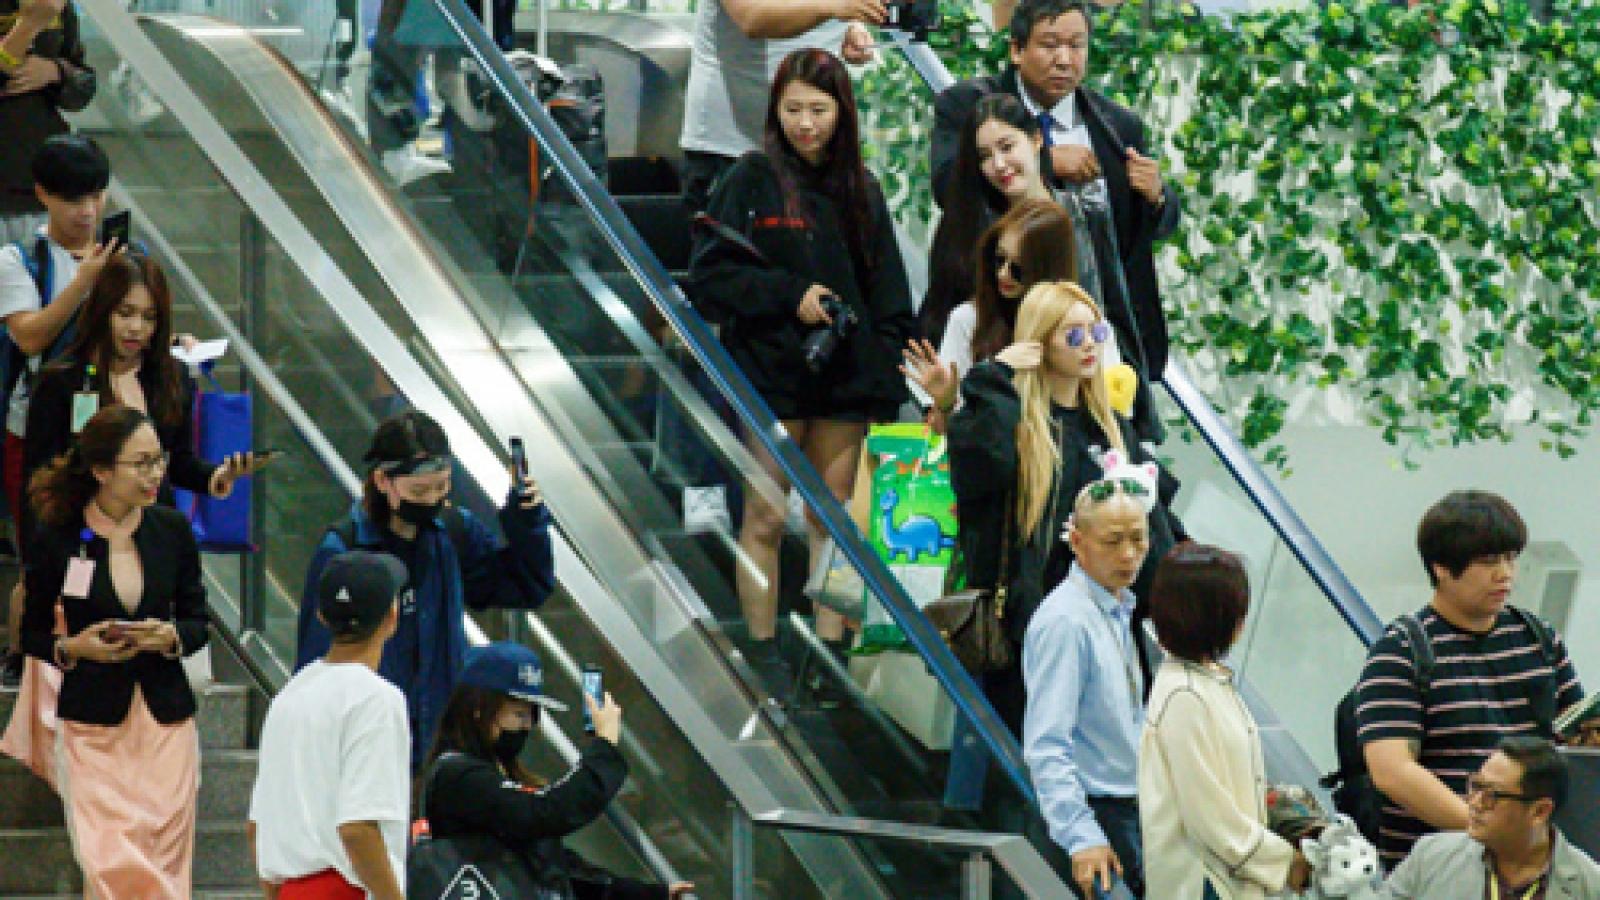 Korean band T-ara warmly welcomed in Vietnam